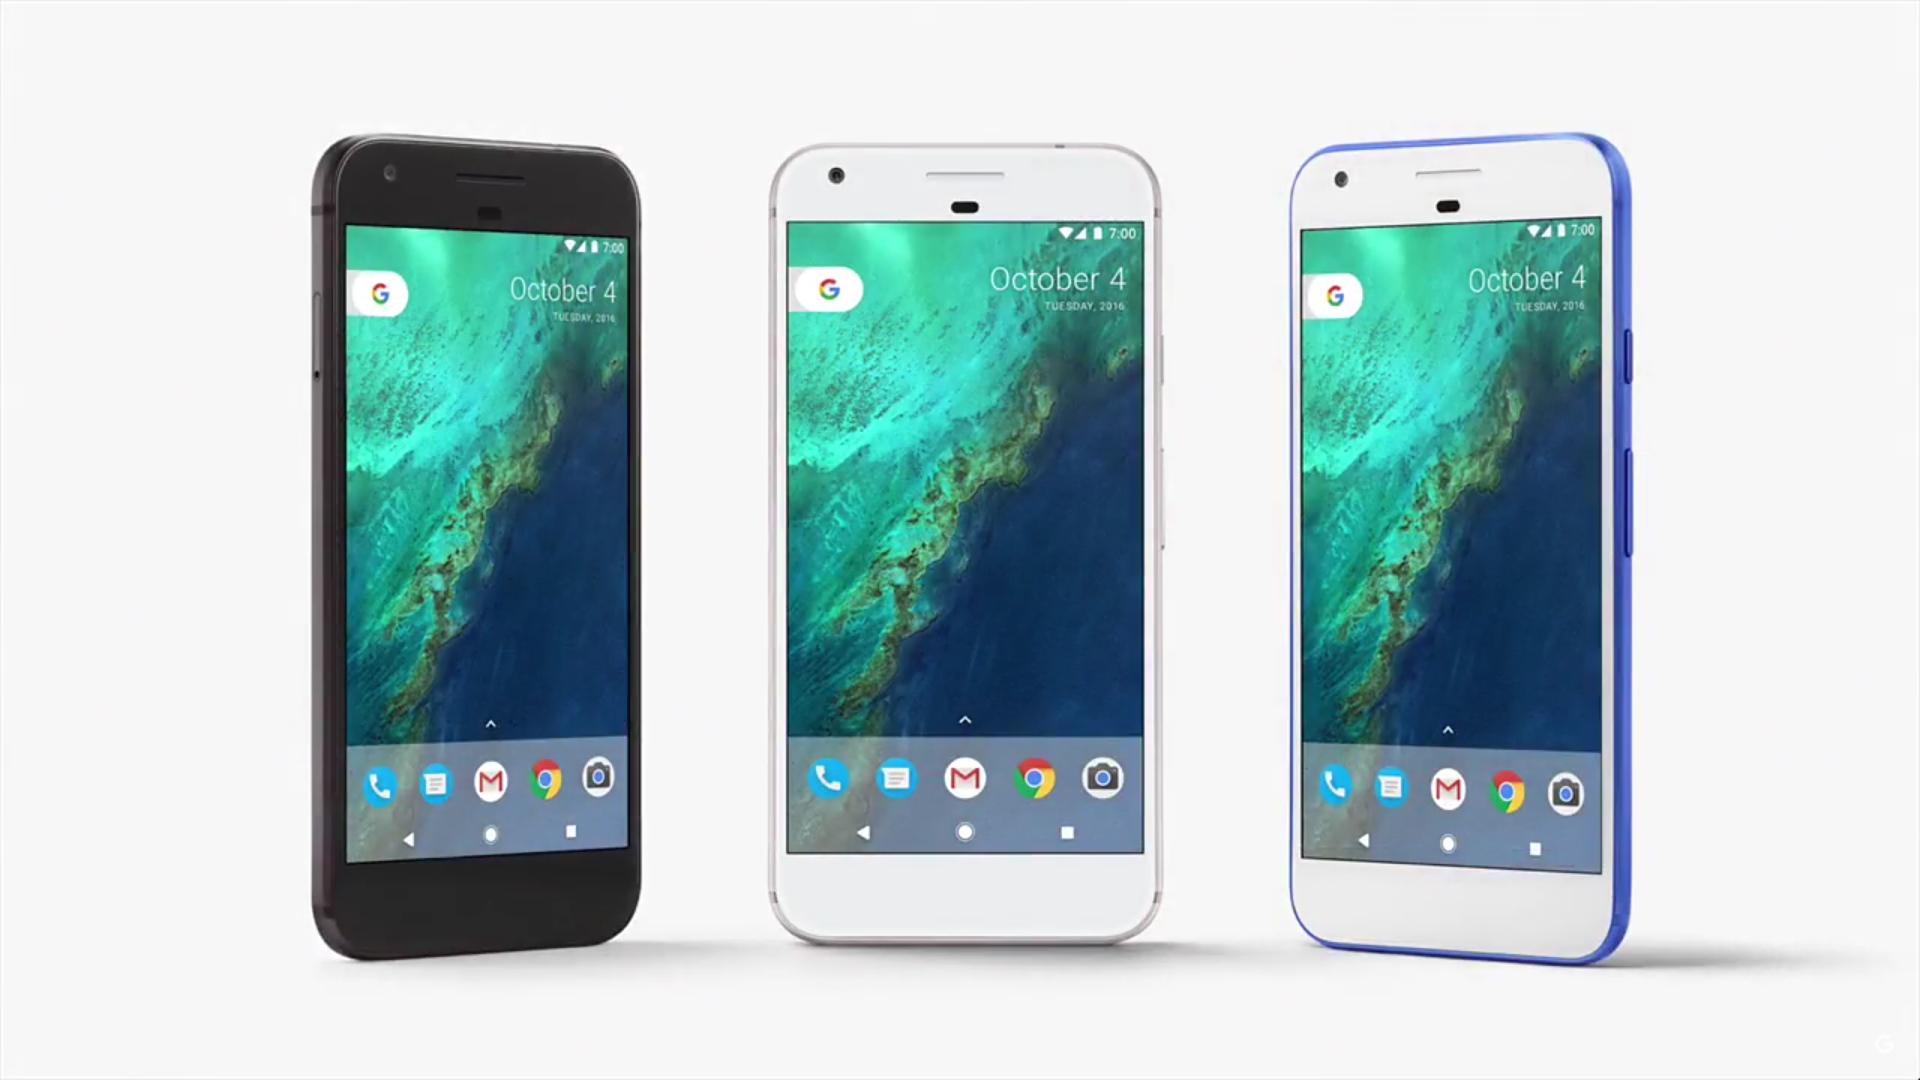 Google New Phone Pixel , HD Wallpaper & Backgrounds